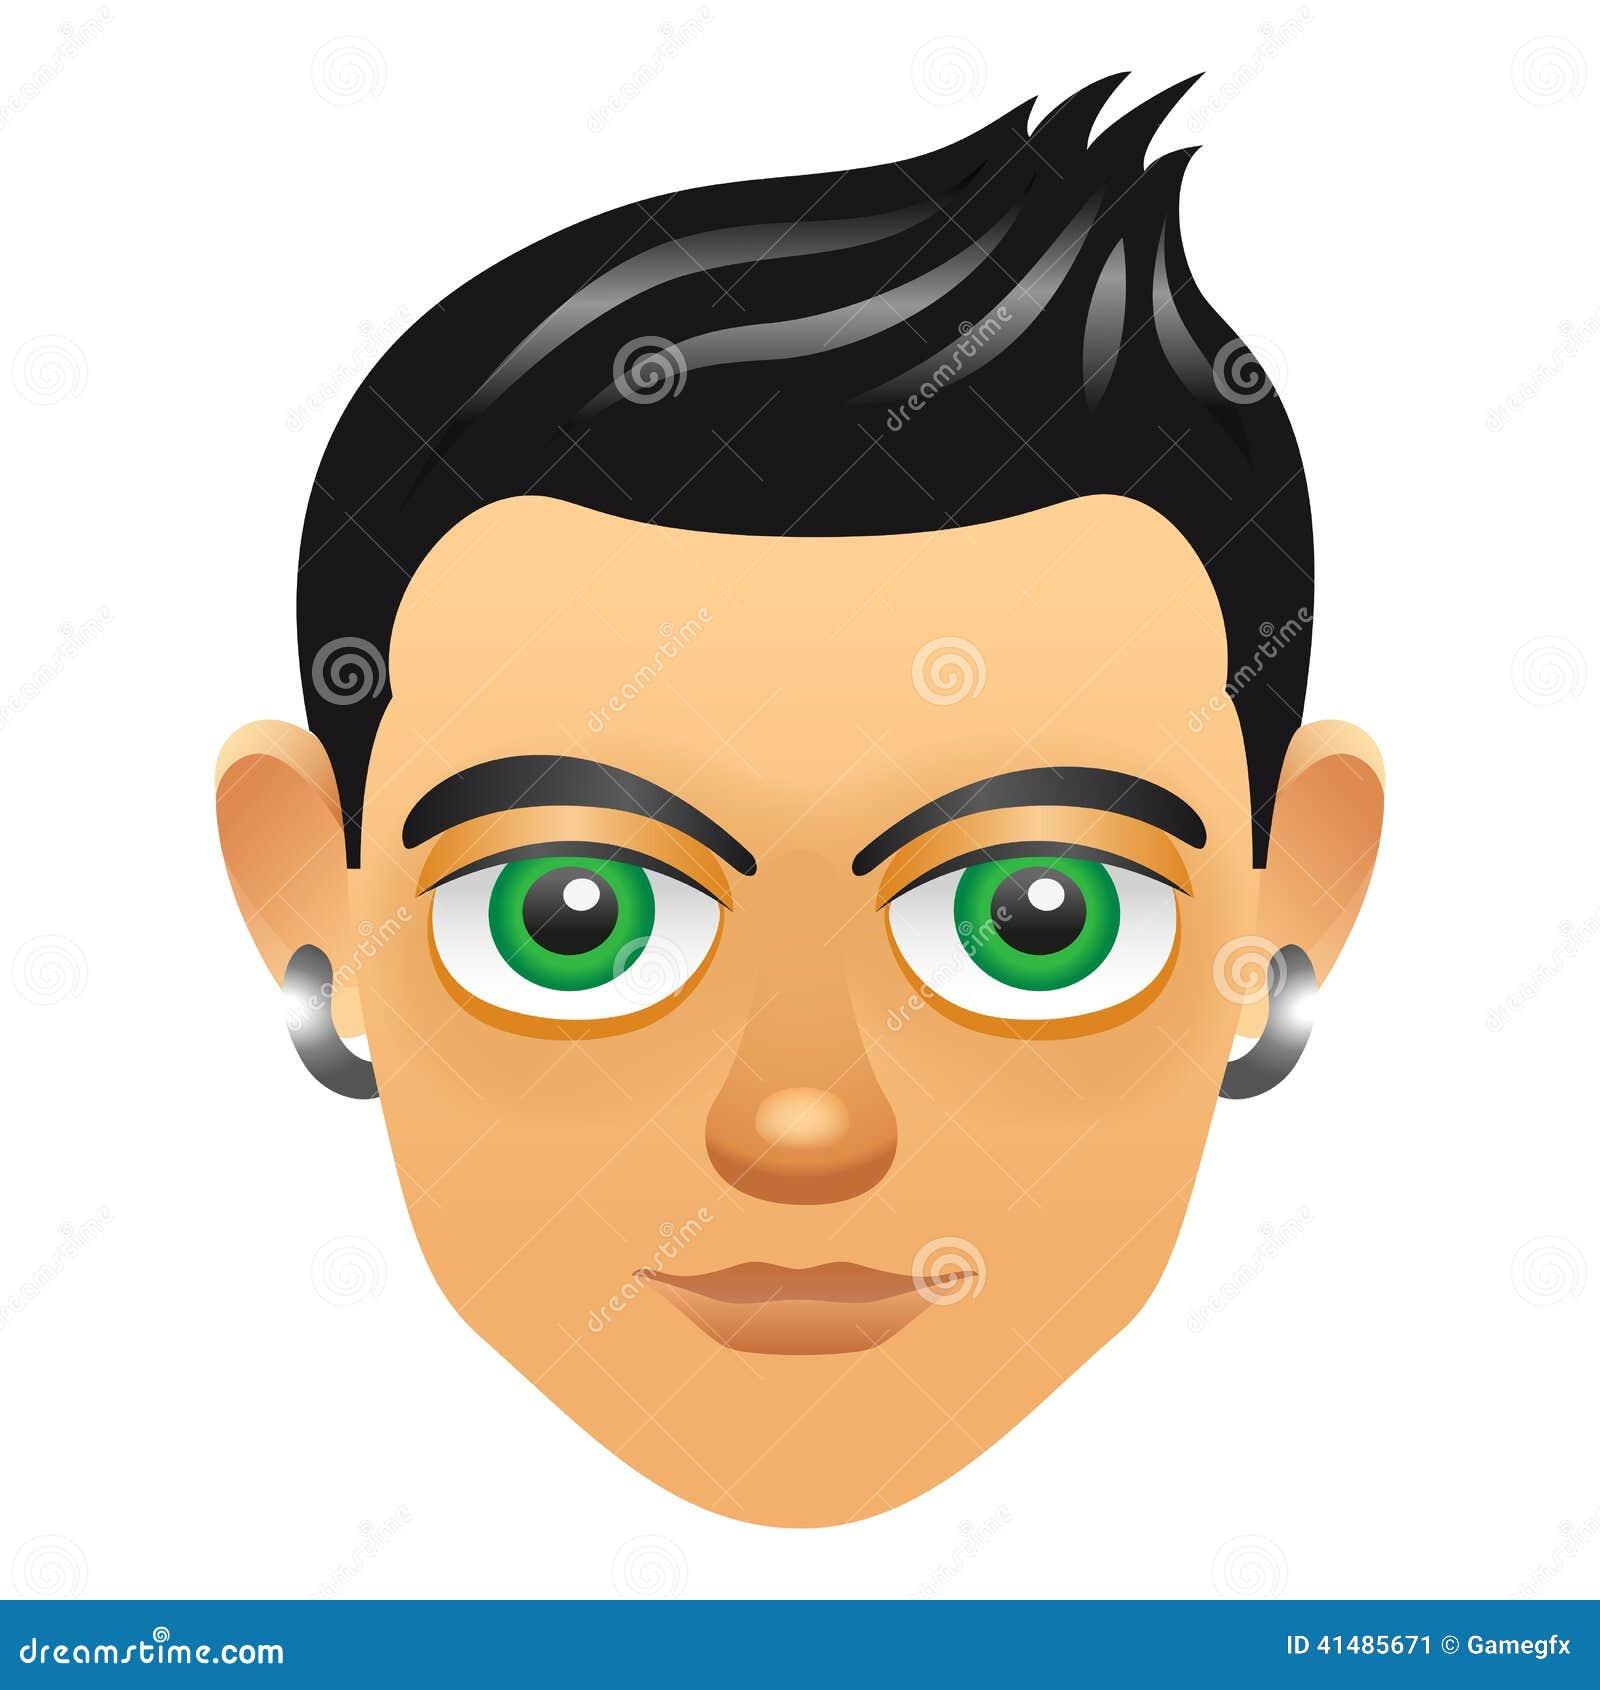 Boy Avatar: Male Portrait Avatar Icon With Boy Face Stock Vector